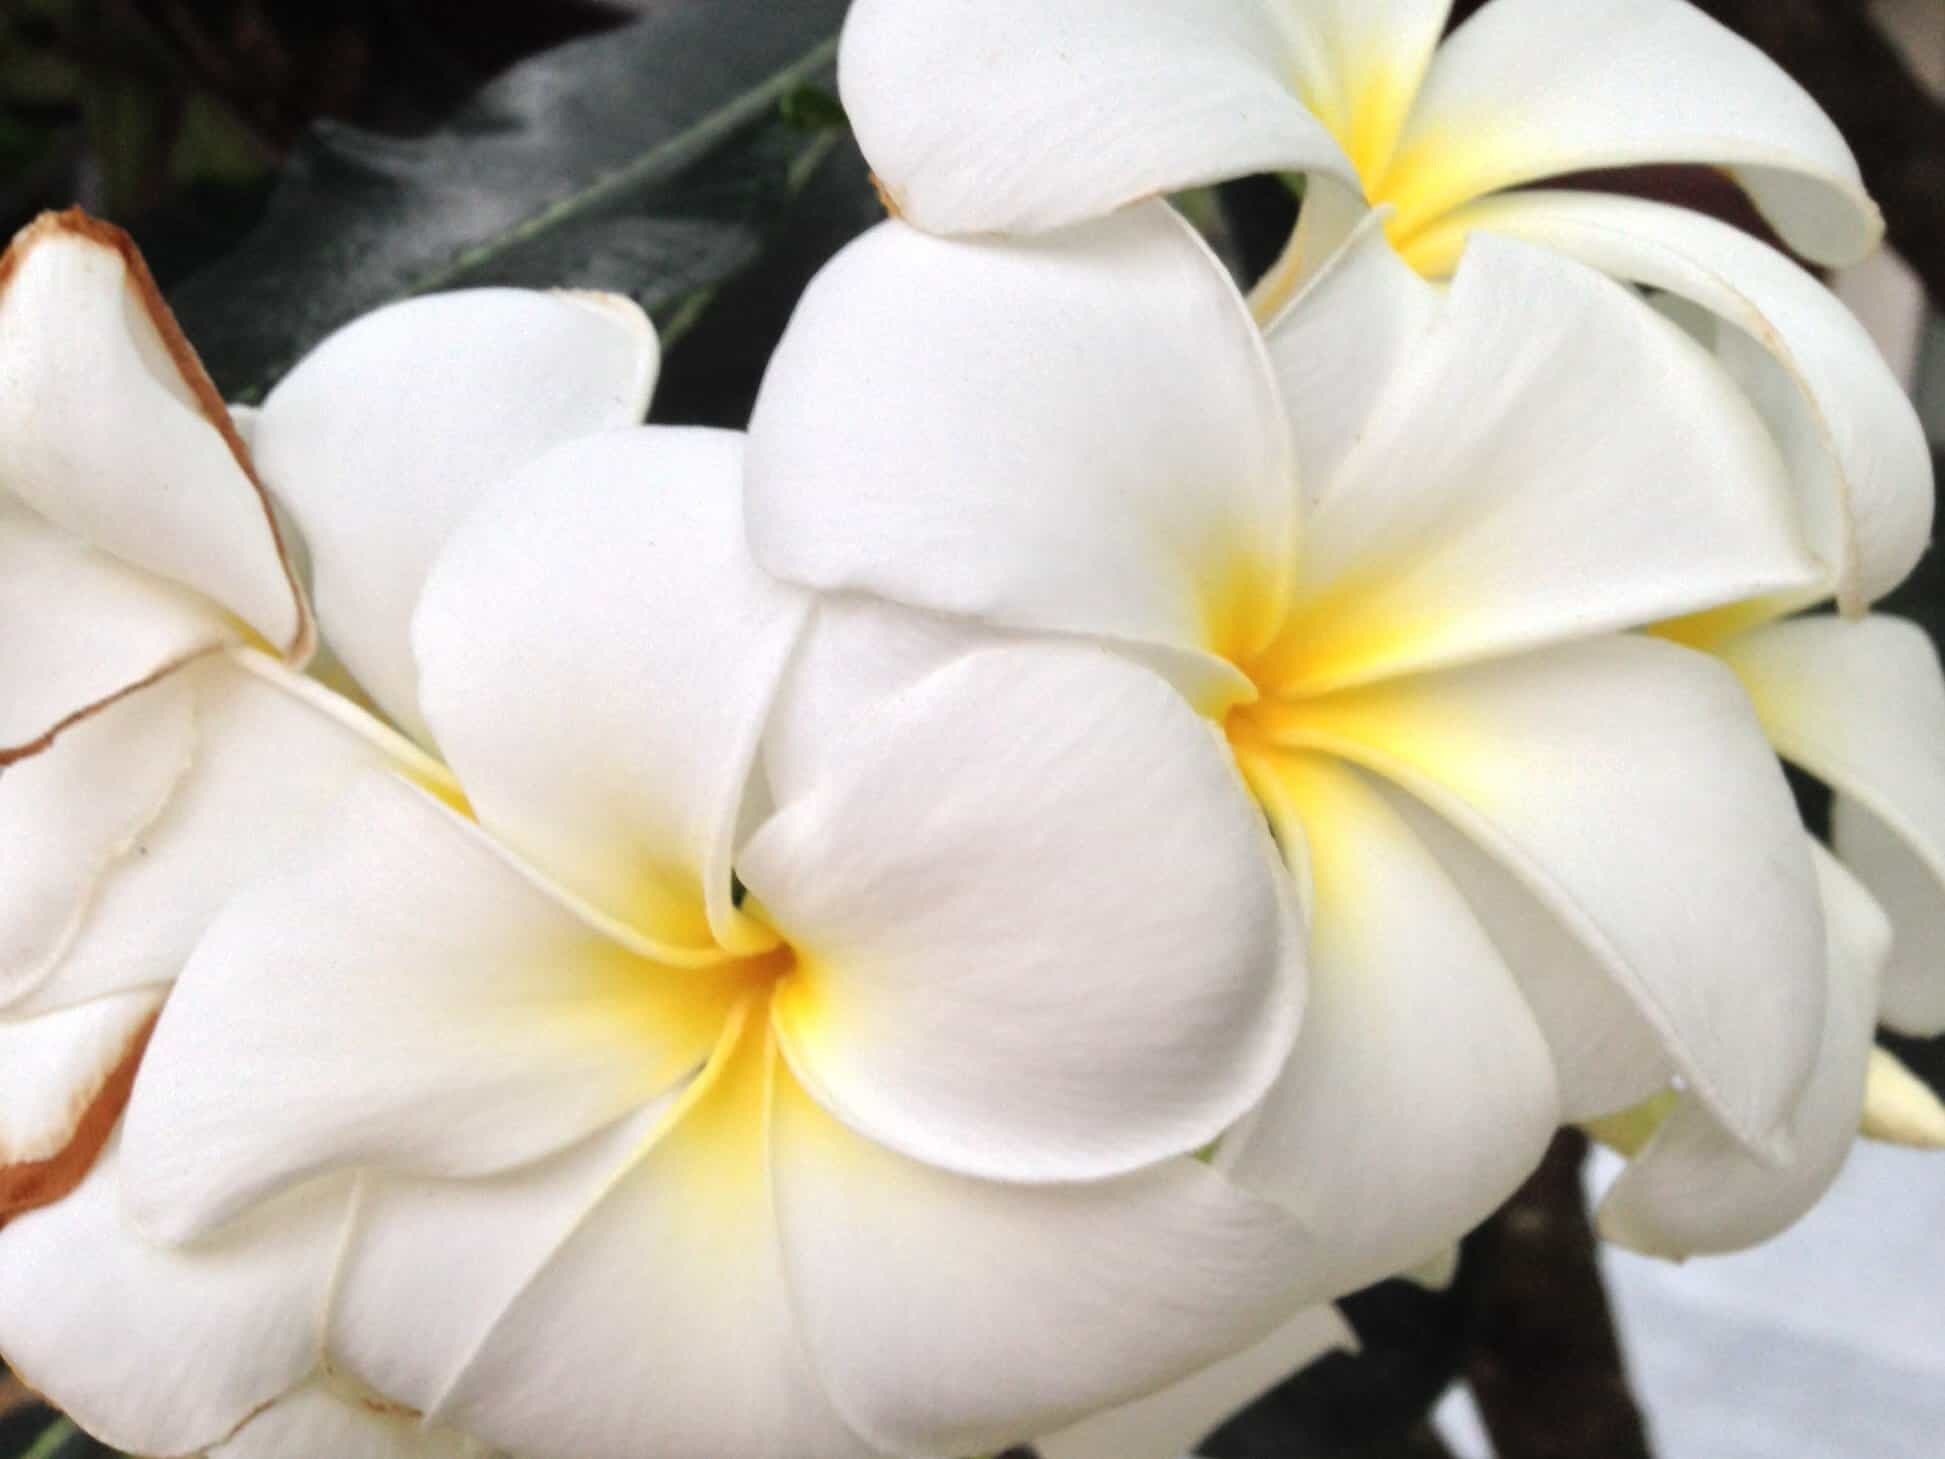 kostenlose bild wei e blume makro pollen stempel frangipani bl tenblatt flora natur. Black Bedroom Furniture Sets. Home Design Ideas